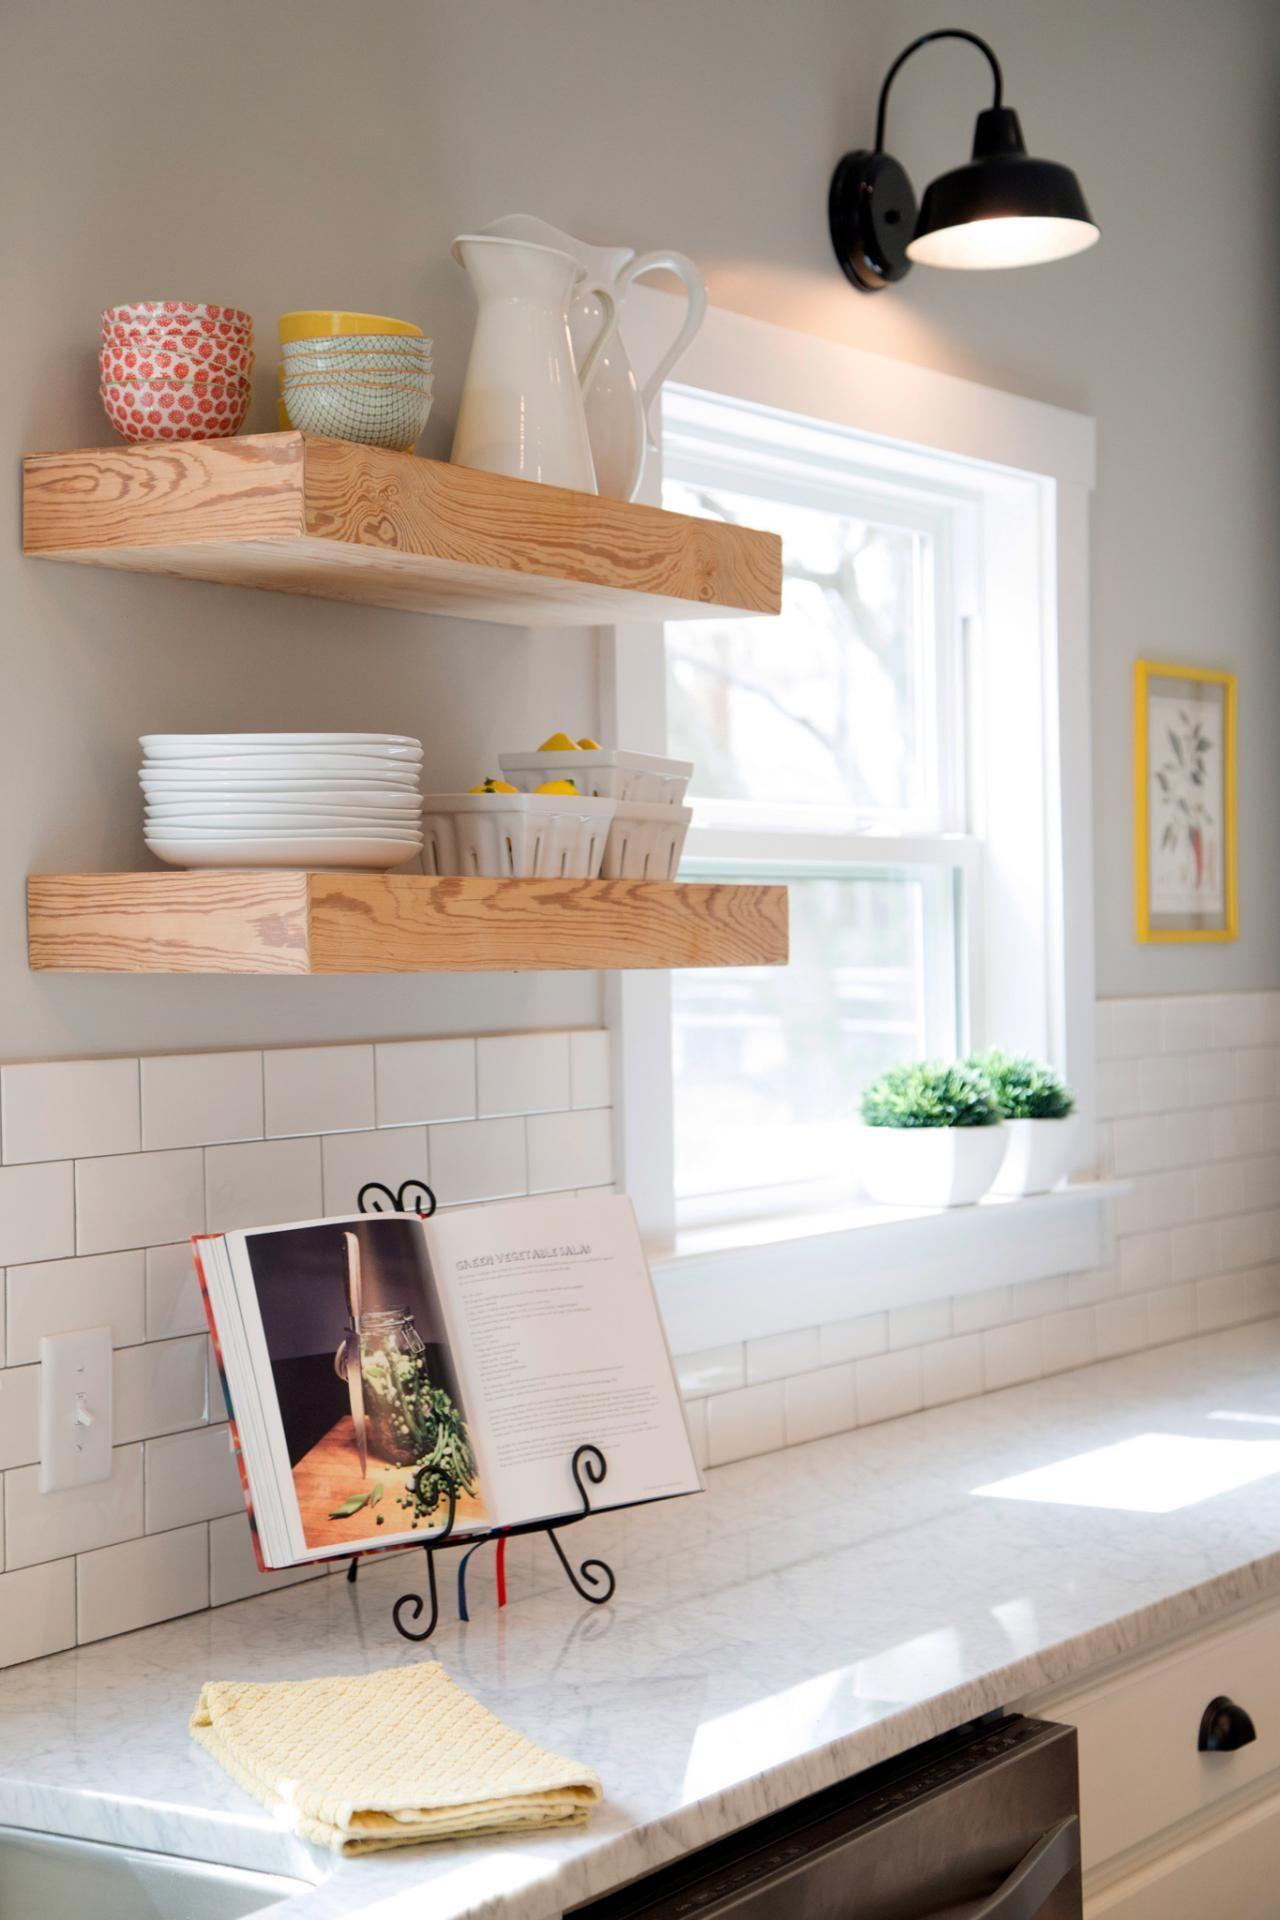 5 Unbelievable Floating Shelves With Led Lights Ideas With Images Floating Shelves Kitchen Wooden Shelves Kitchen Open Kitchen Shelves